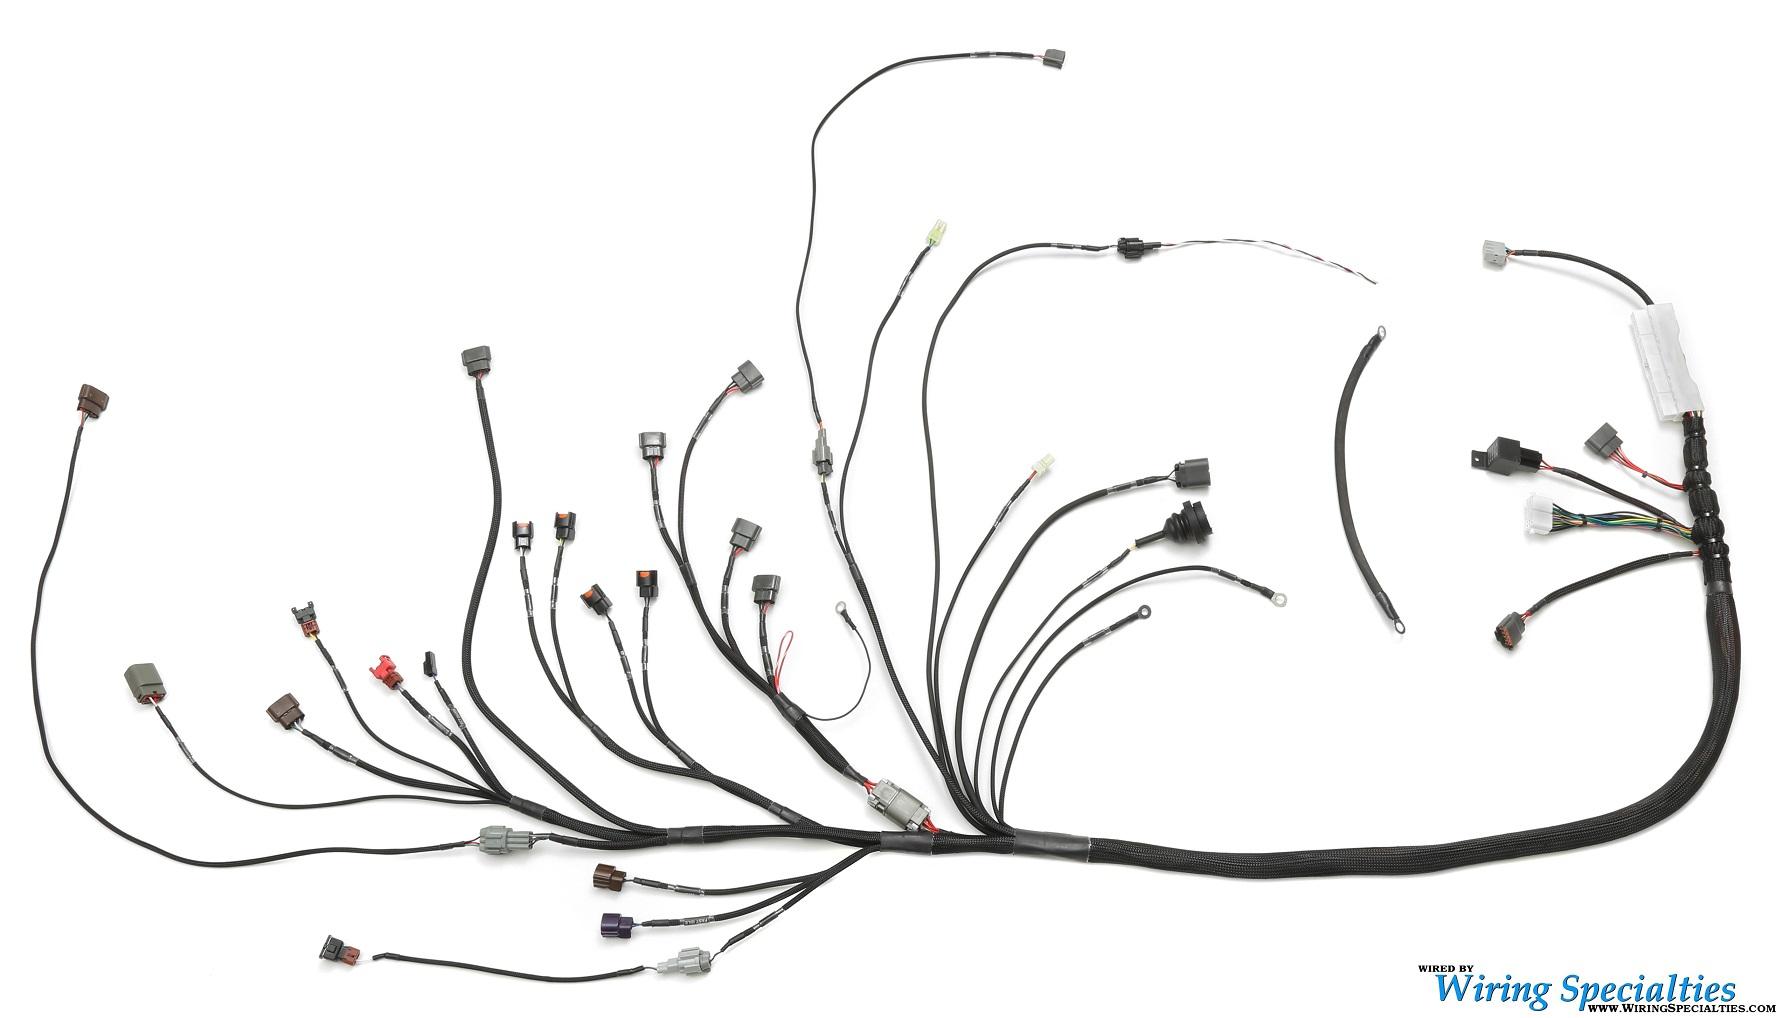 350z S13 Sr20det Swap Wiring Harness Wiring Specialties